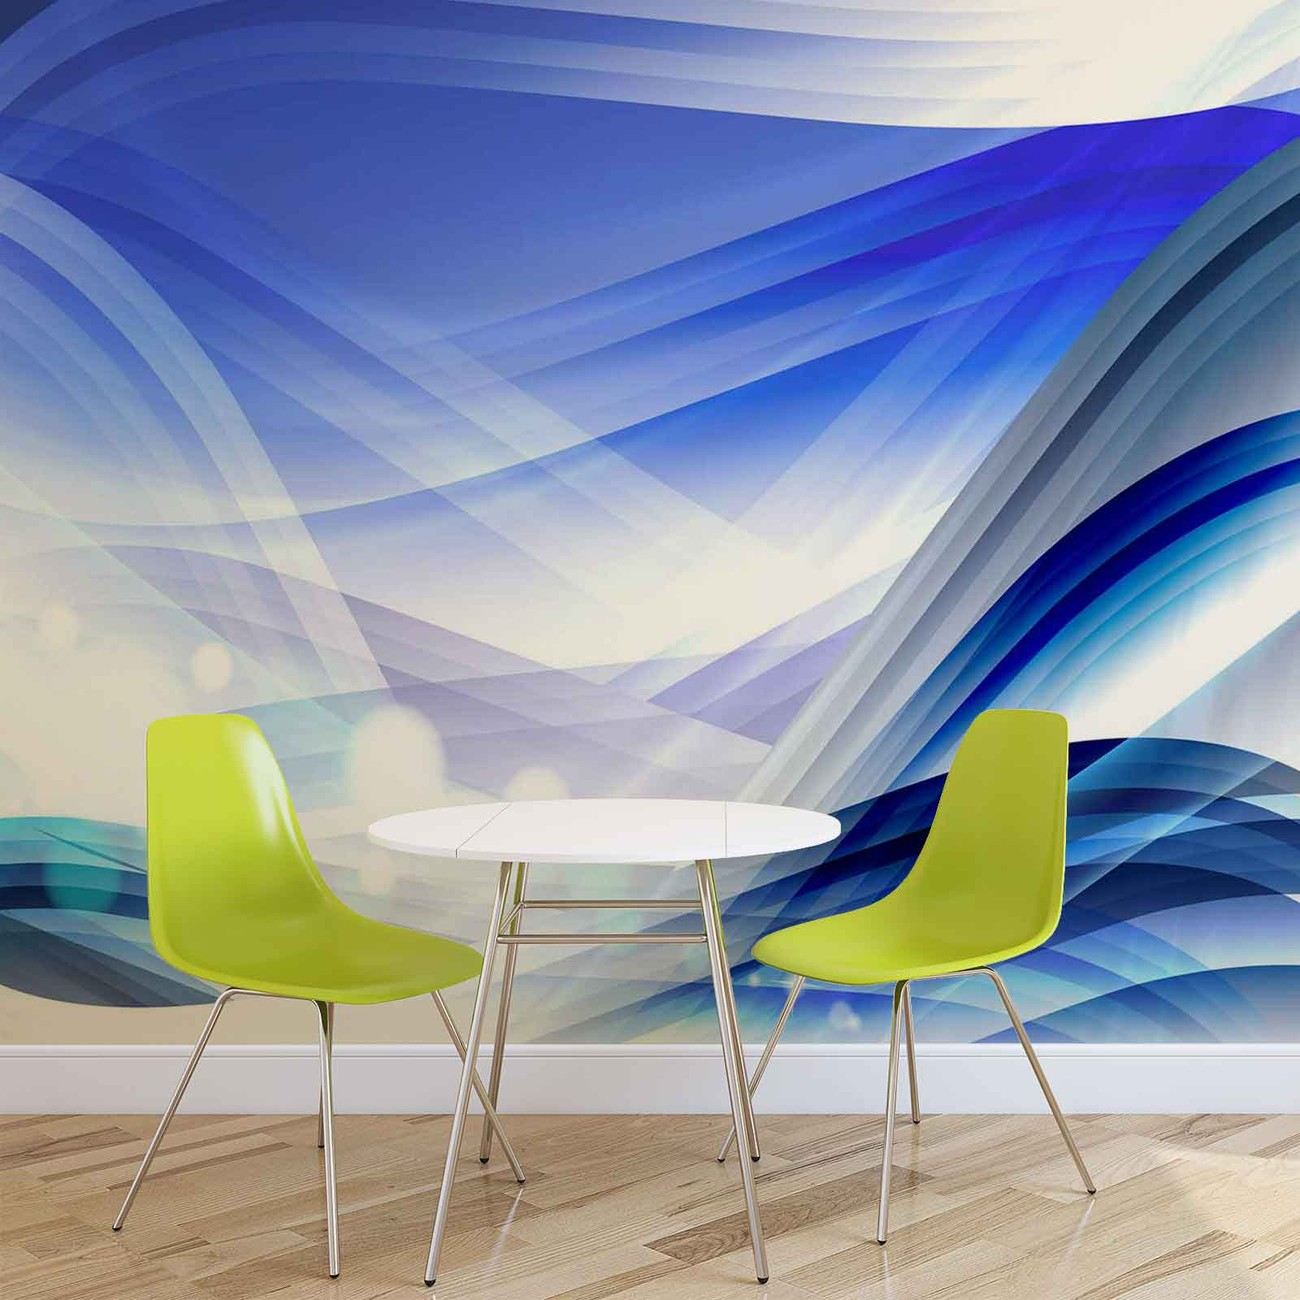 fototapete tapete abstrakt muster wellen bei europosters. Black Bedroom Furniture Sets. Home Design Ideas